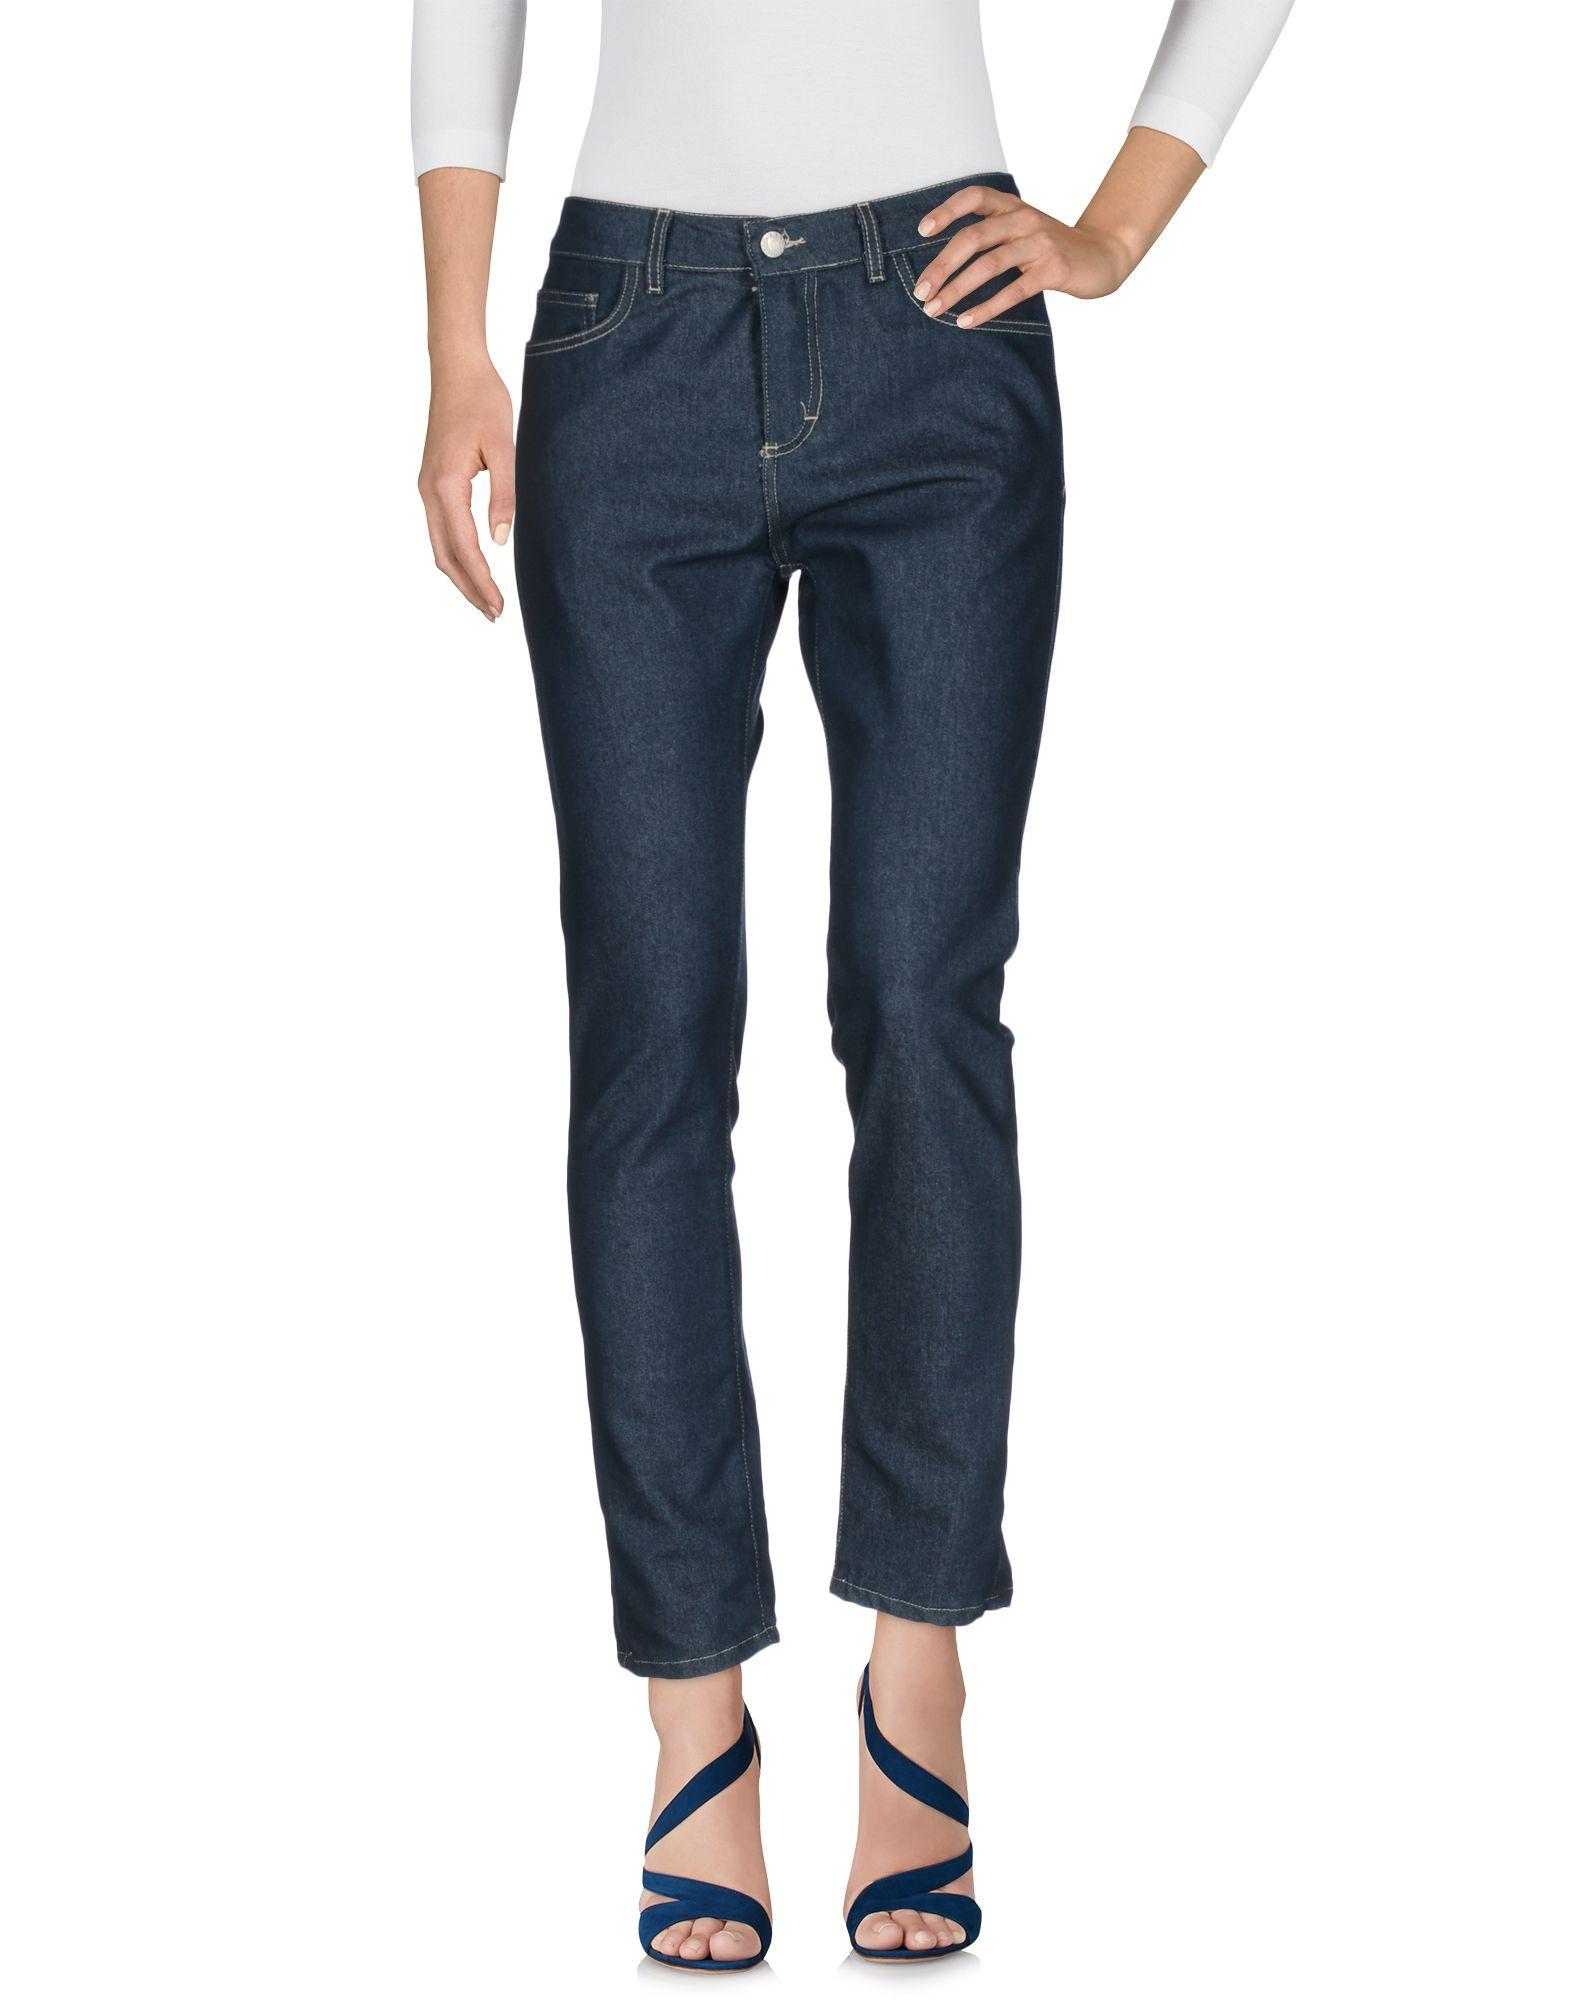 Mirror Jeans